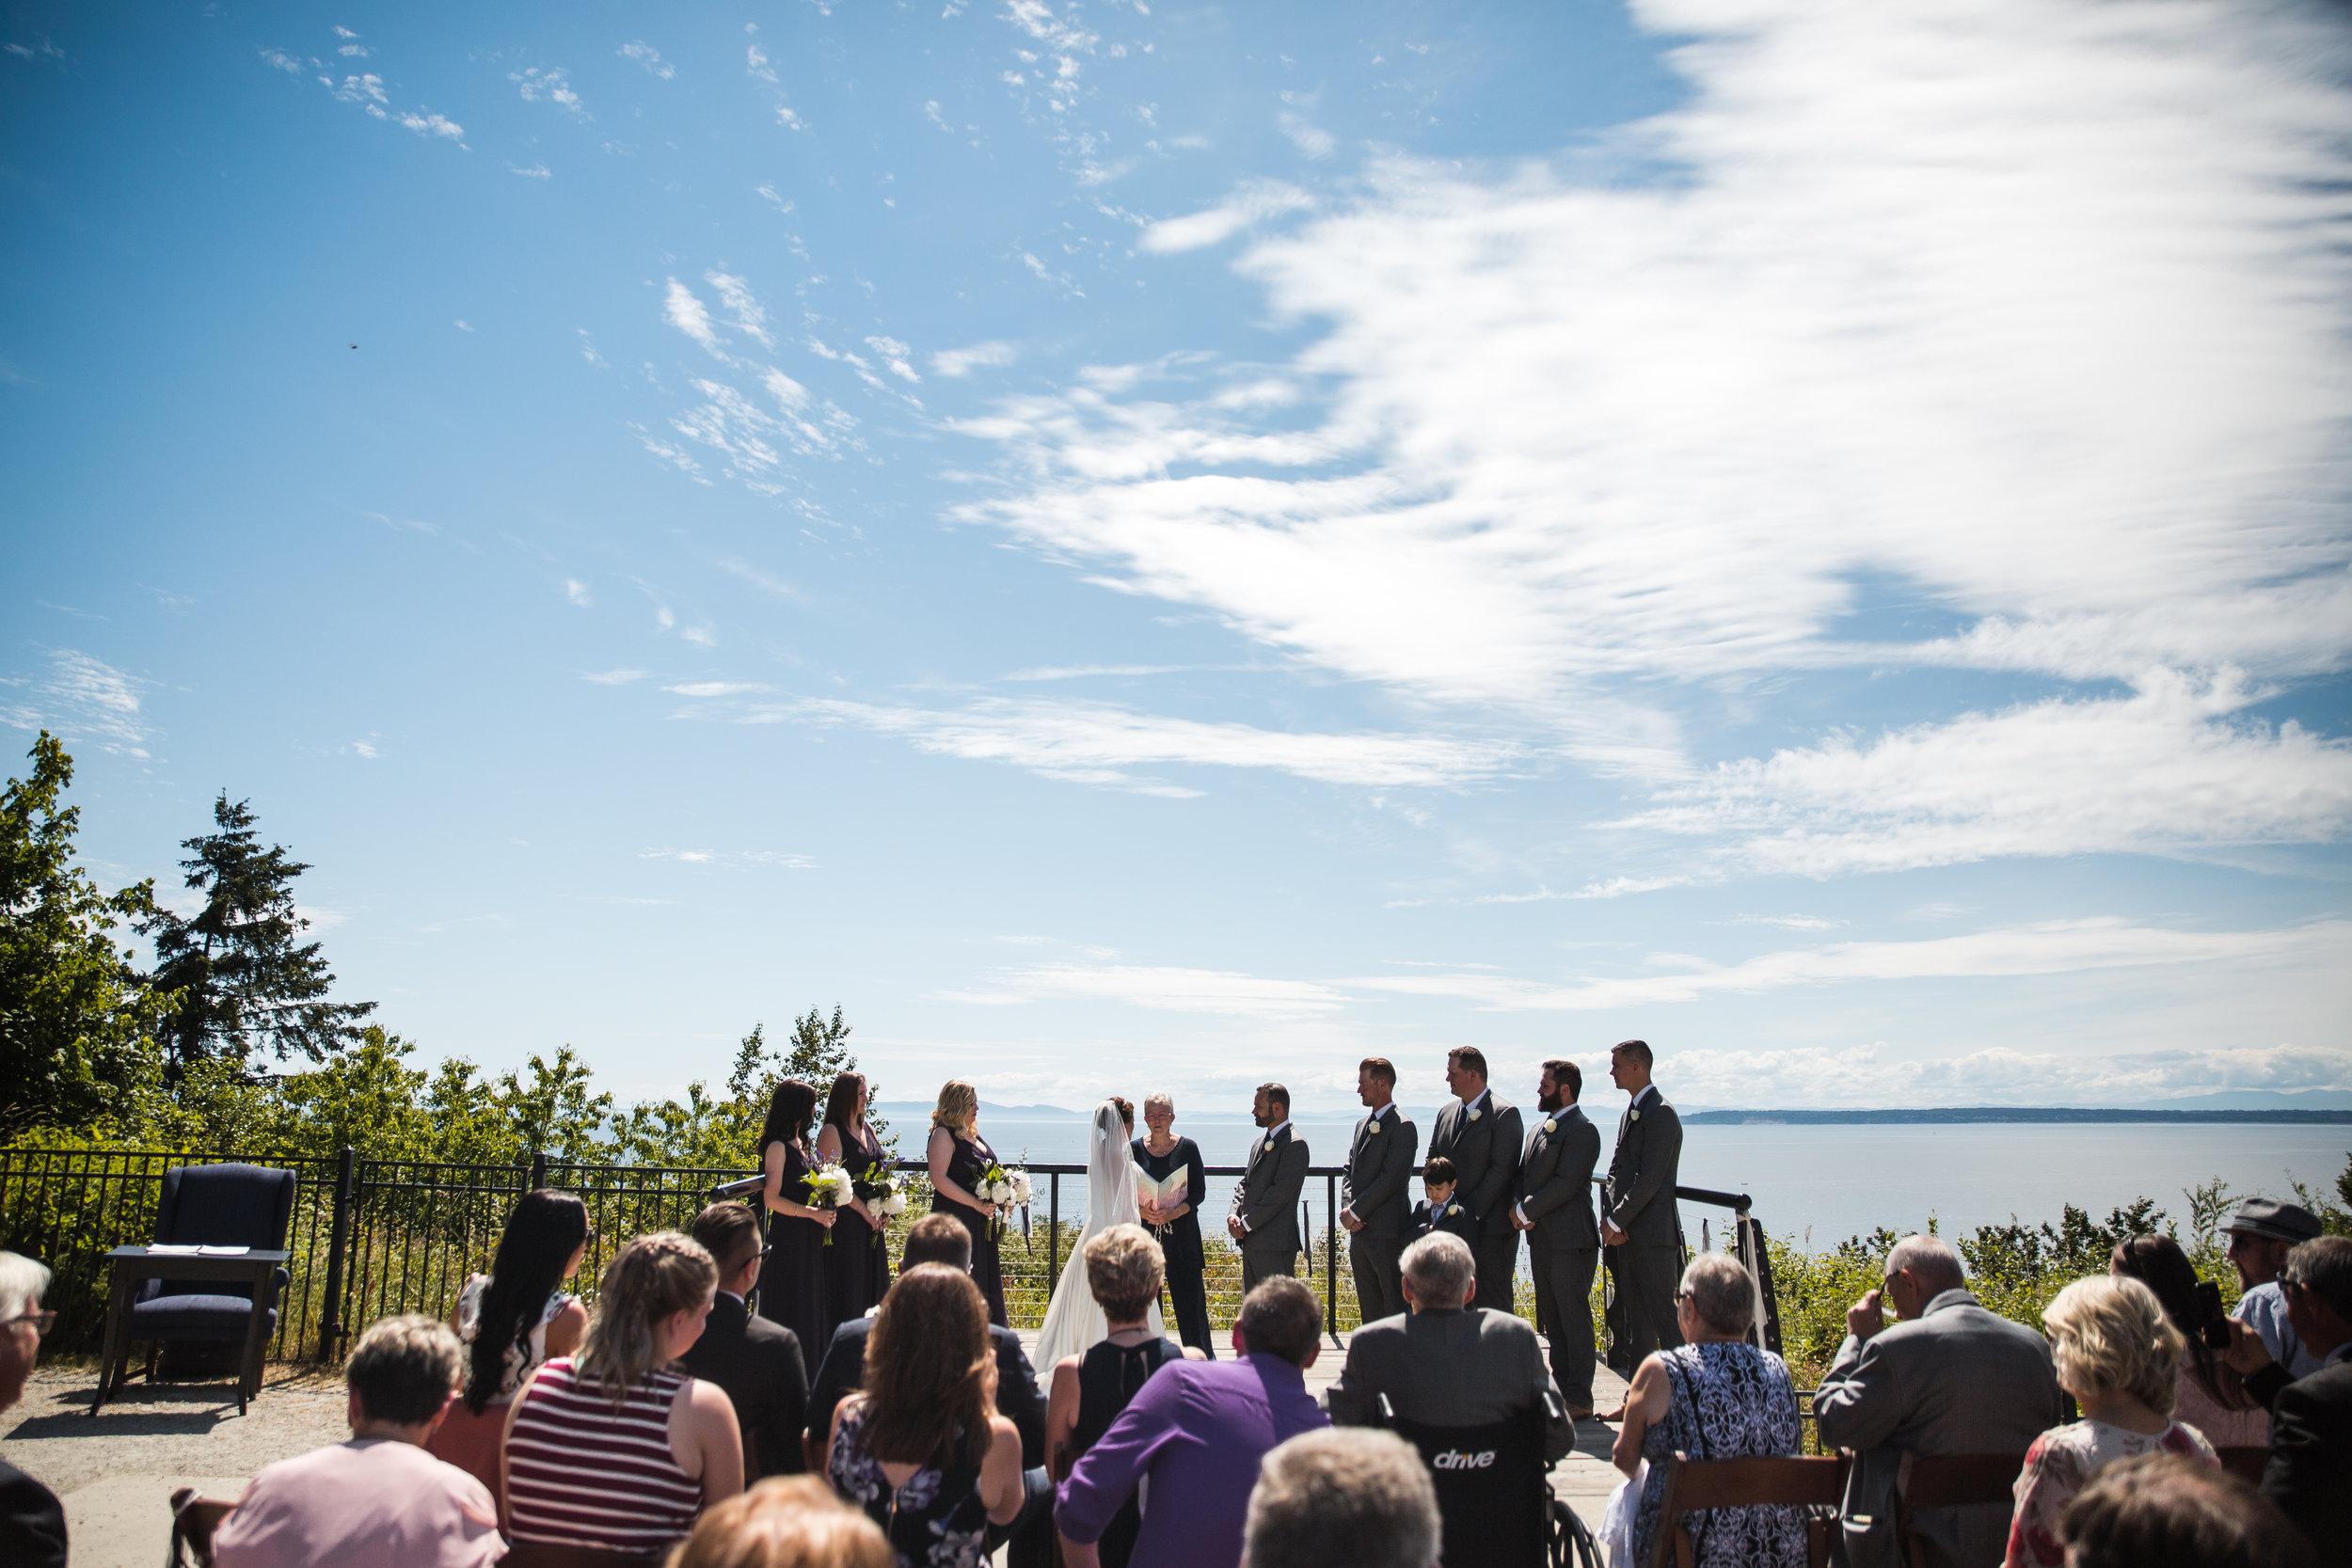 kwomais point park outdoor wedding photographer